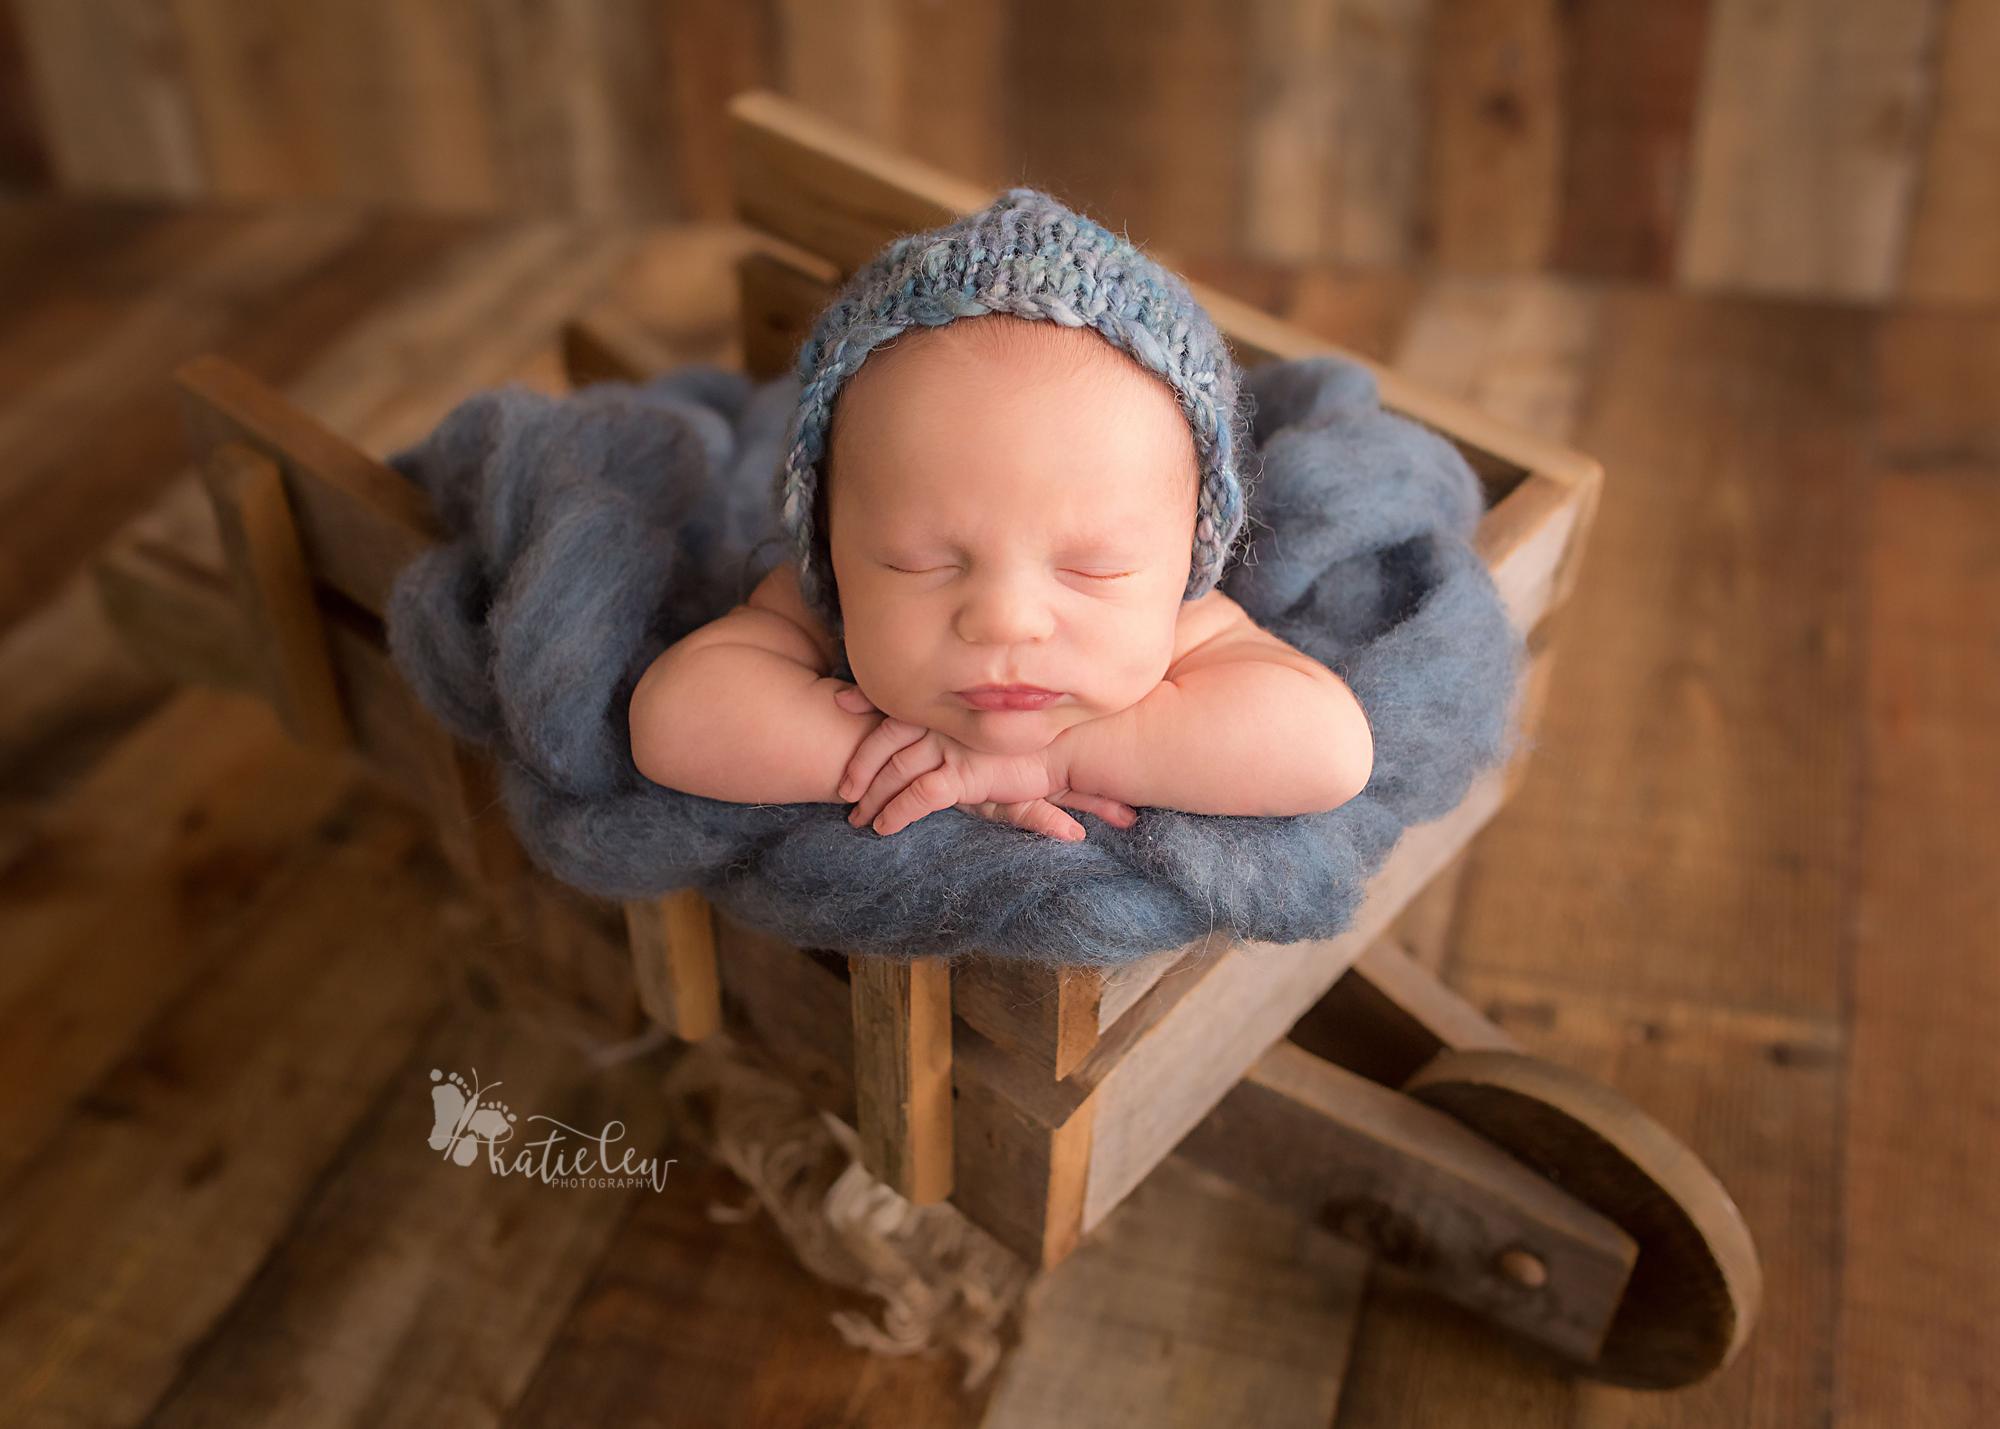 baby boy in a wheel barrow